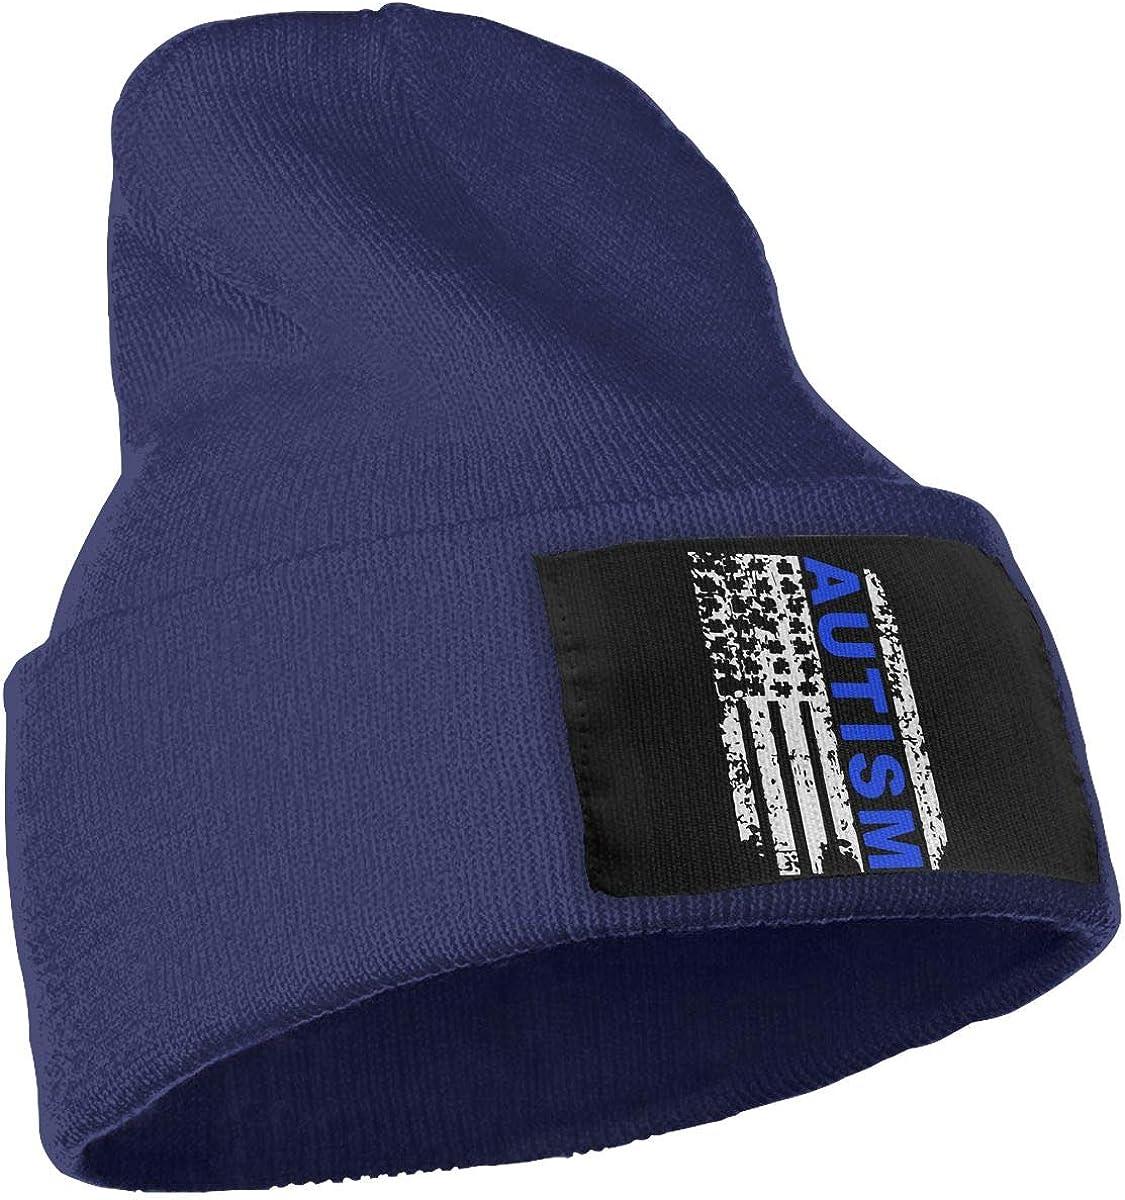 Autism Awareness Flag Original Beanie Hat Unisex 100/% Acrylic Knit Hat Cap